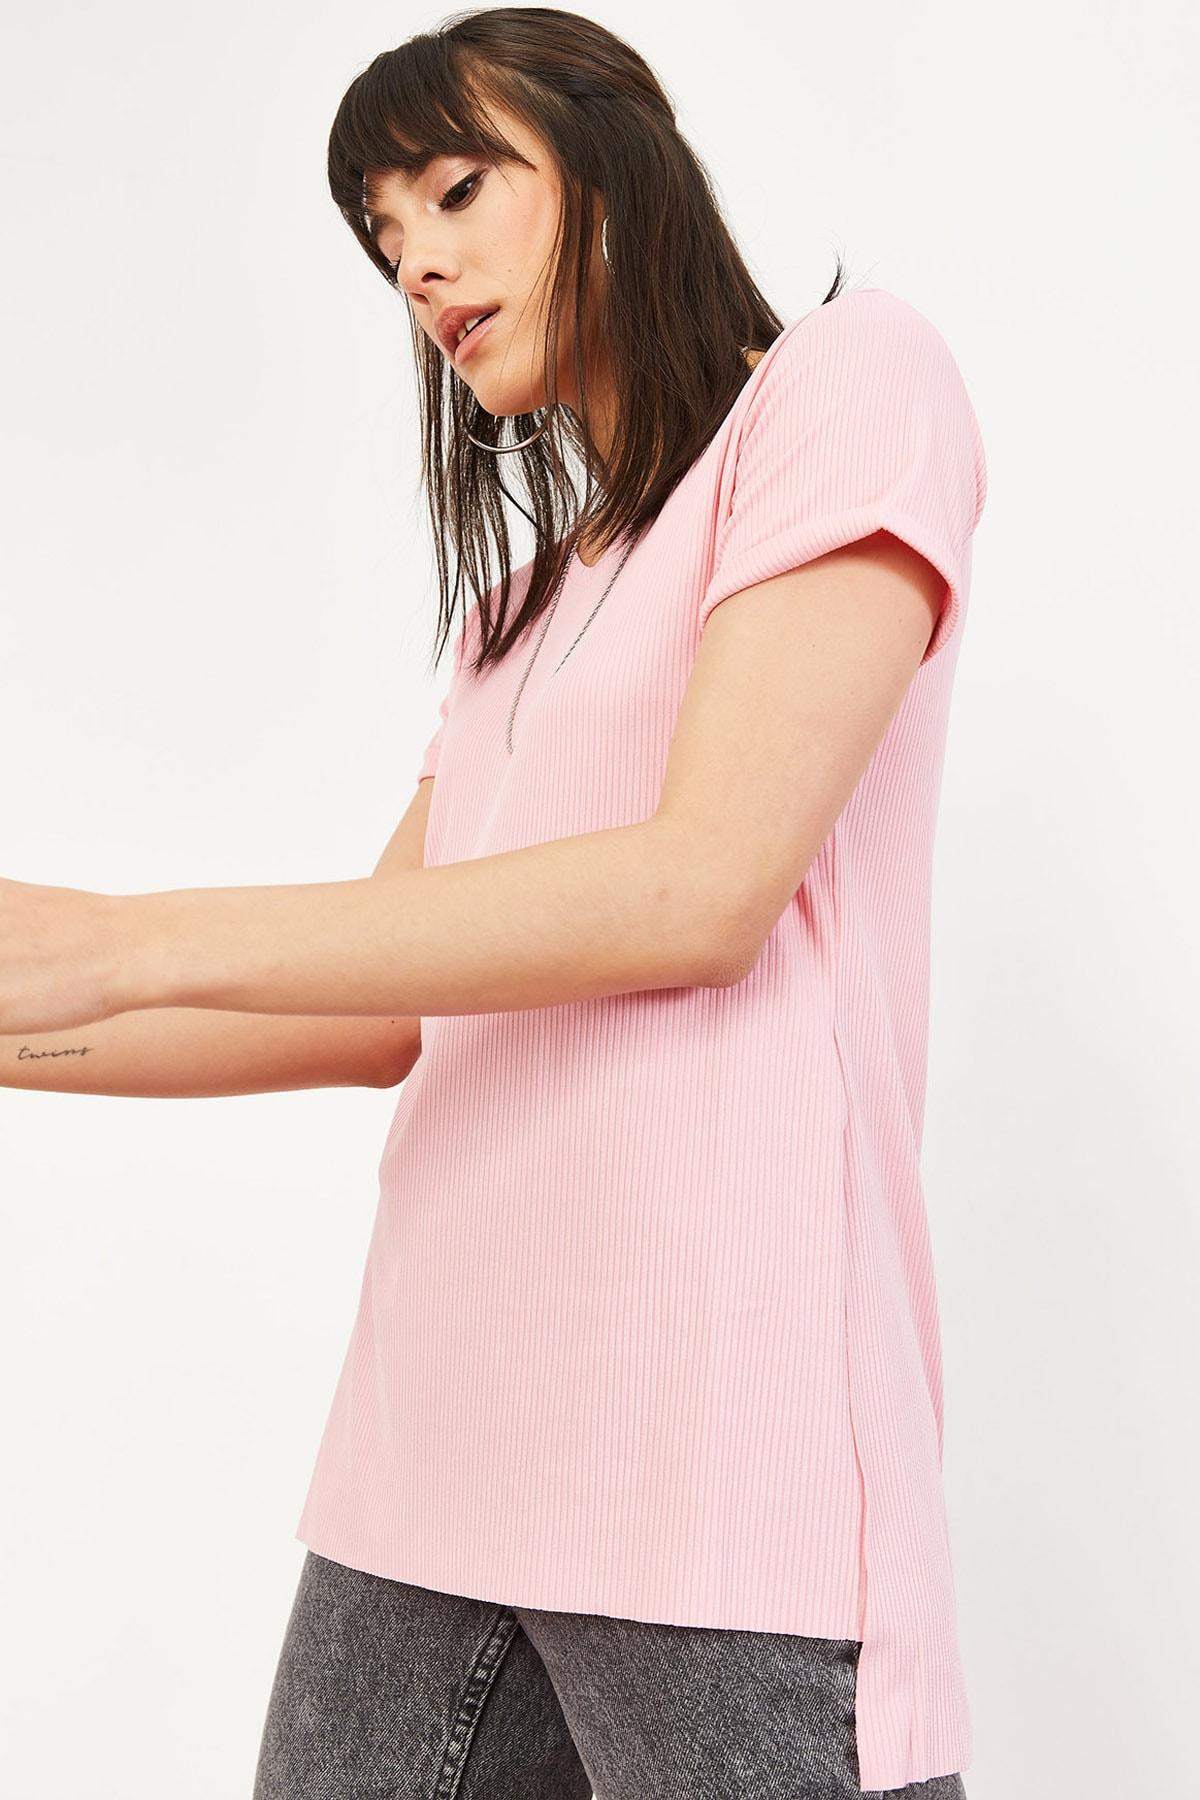 Bianco Lucci Kadın Pudra Kol Yan Yırtmaçlı Kol Detay Kaşkorse T-Shirt 10051012 3